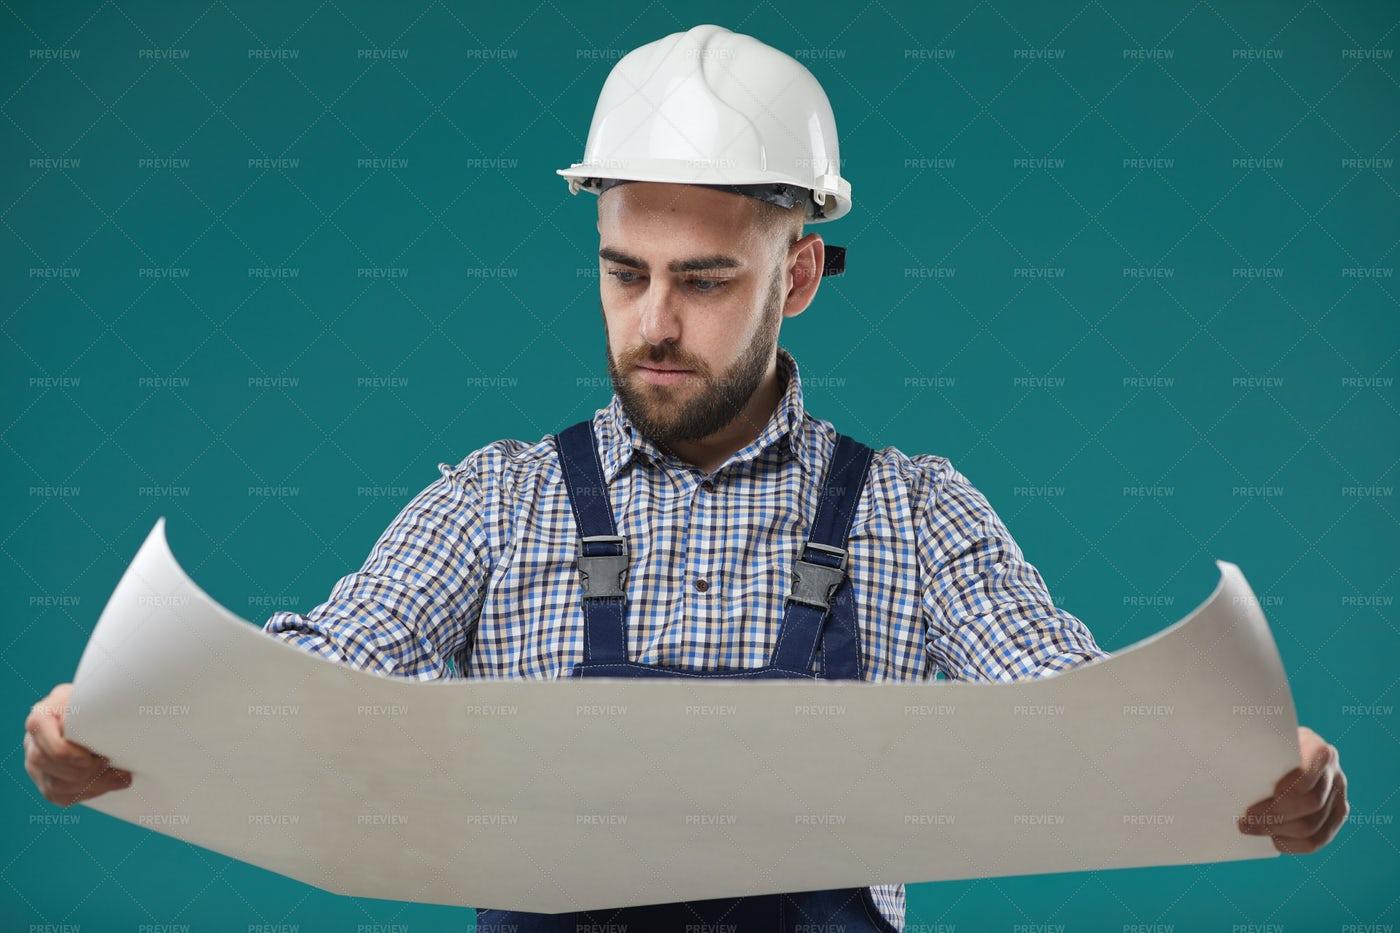 Foreman Looking At Building Plan: Stock Photos